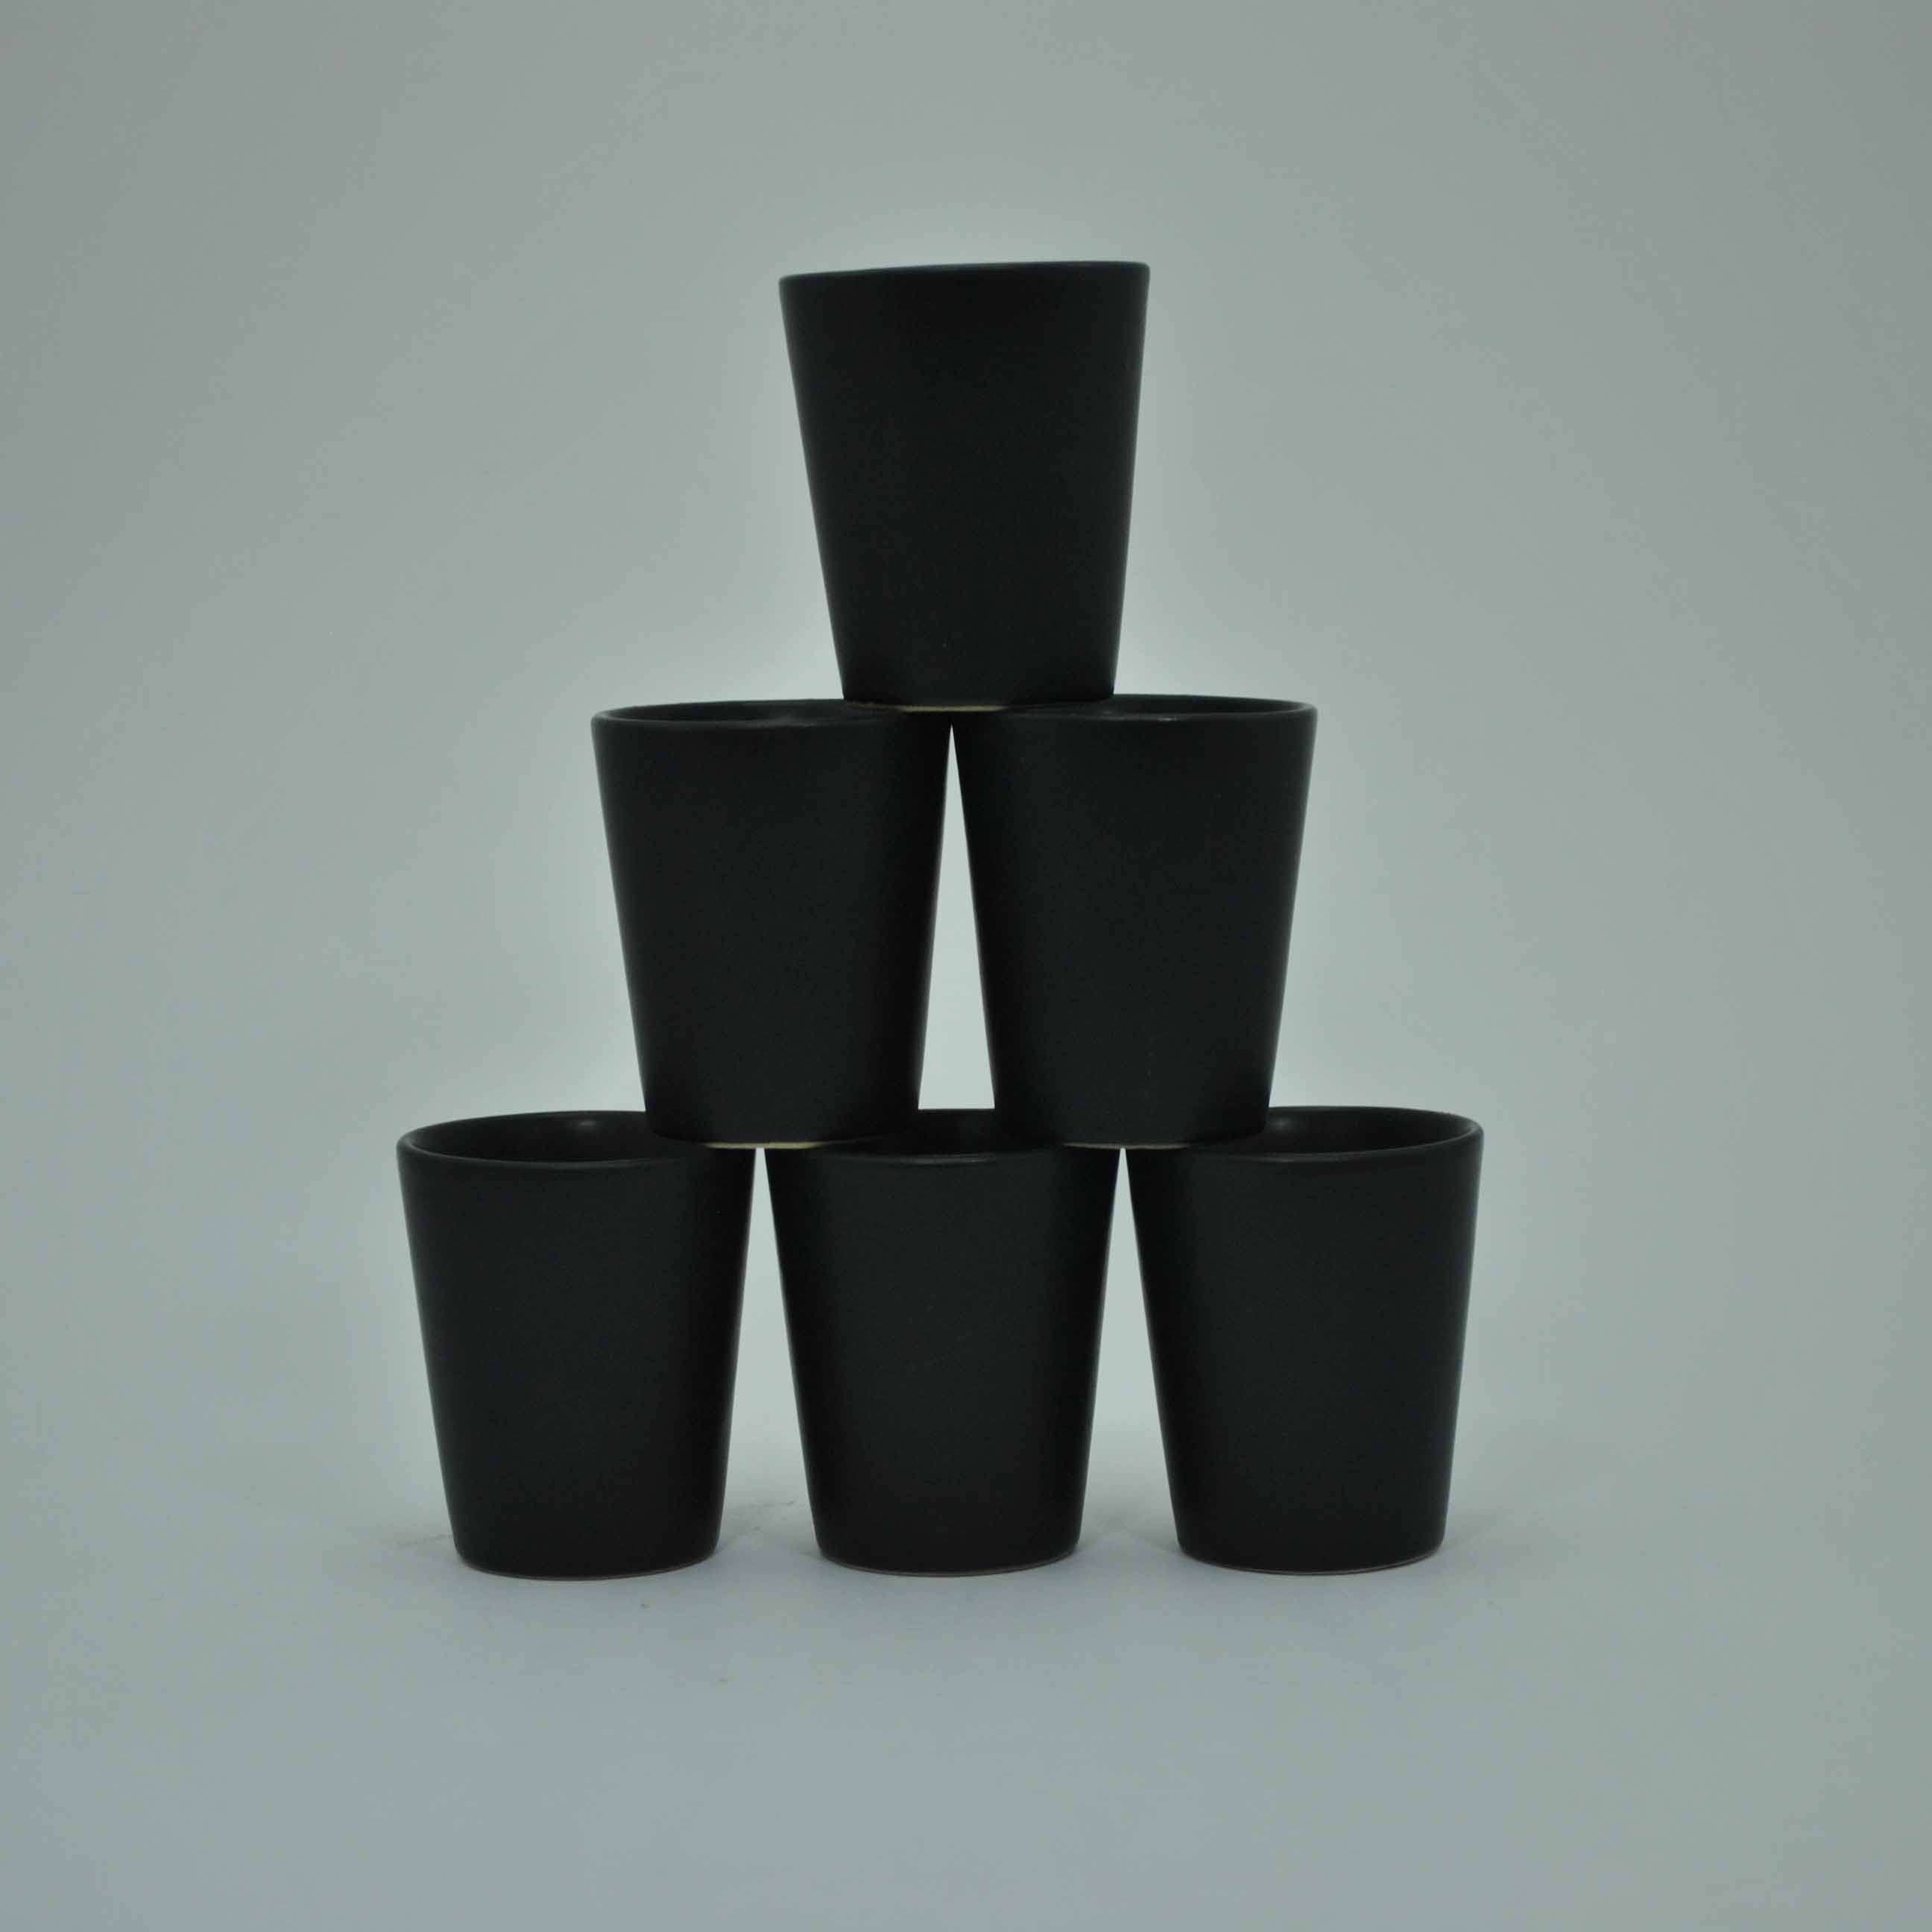 Ceramic Shot Glasses Black (set of 6)